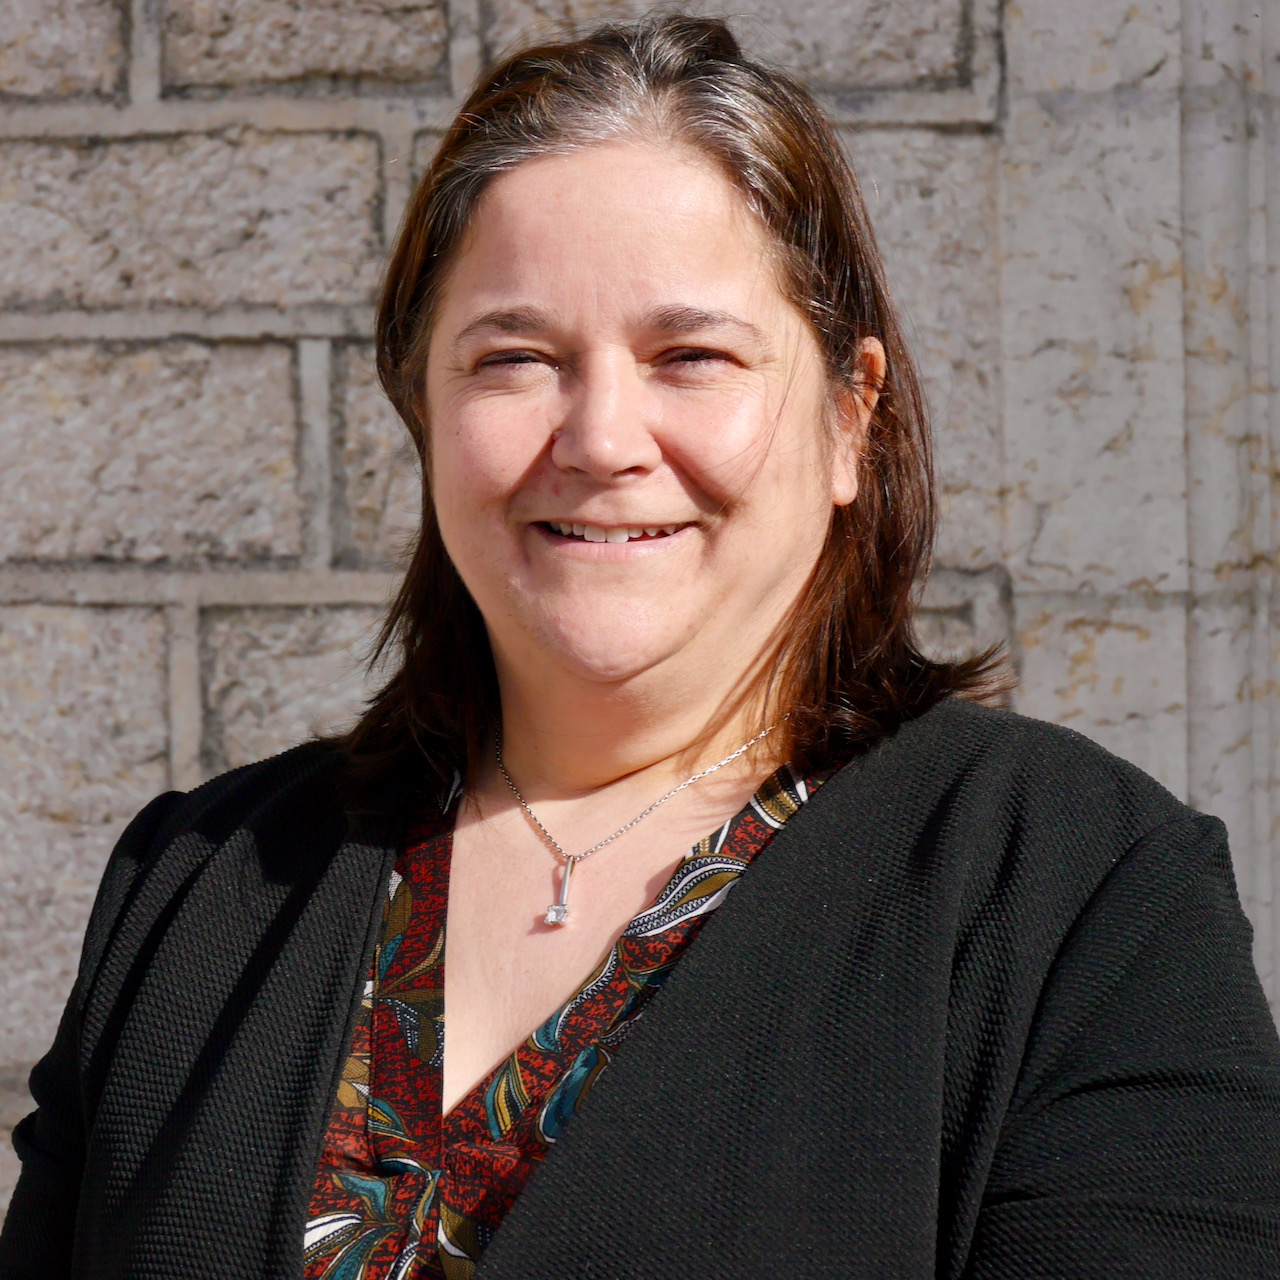 Carmen Vallet